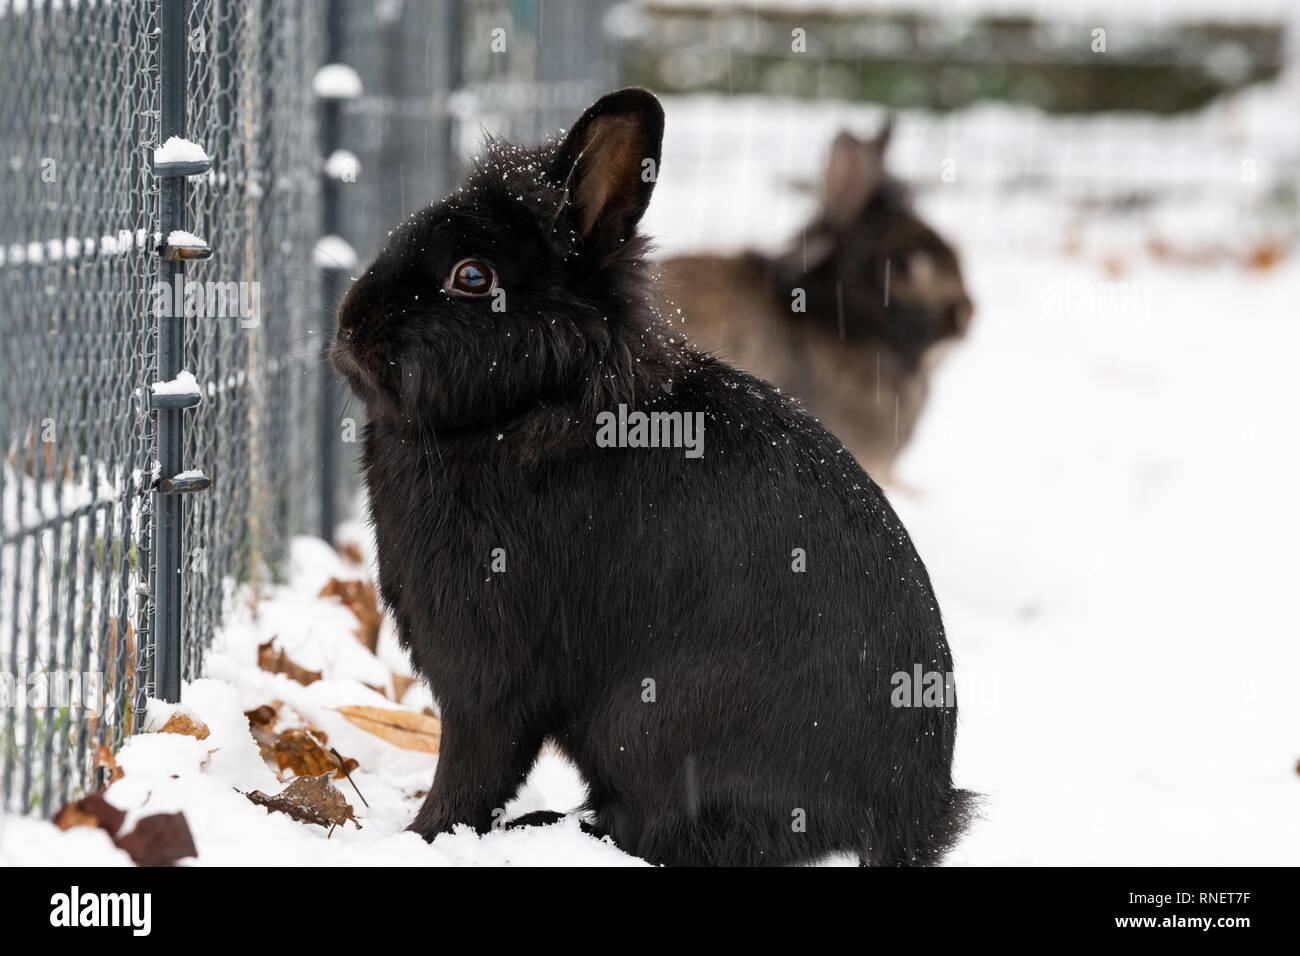 A black dwarf rabbit (lions head) sitting in the snow Stock Photo